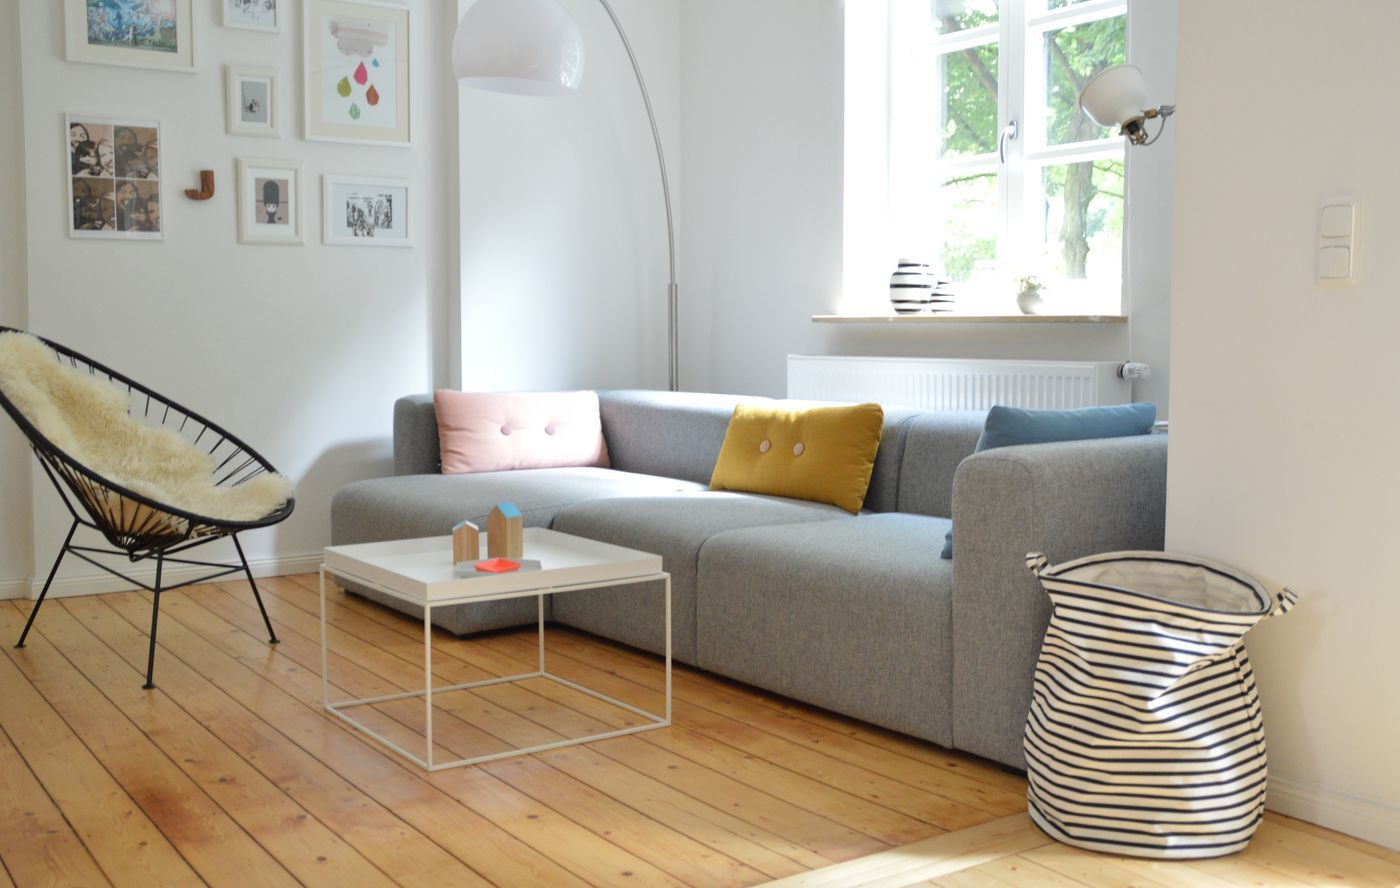 Uberlegen Skandinavische Wohnzimmer